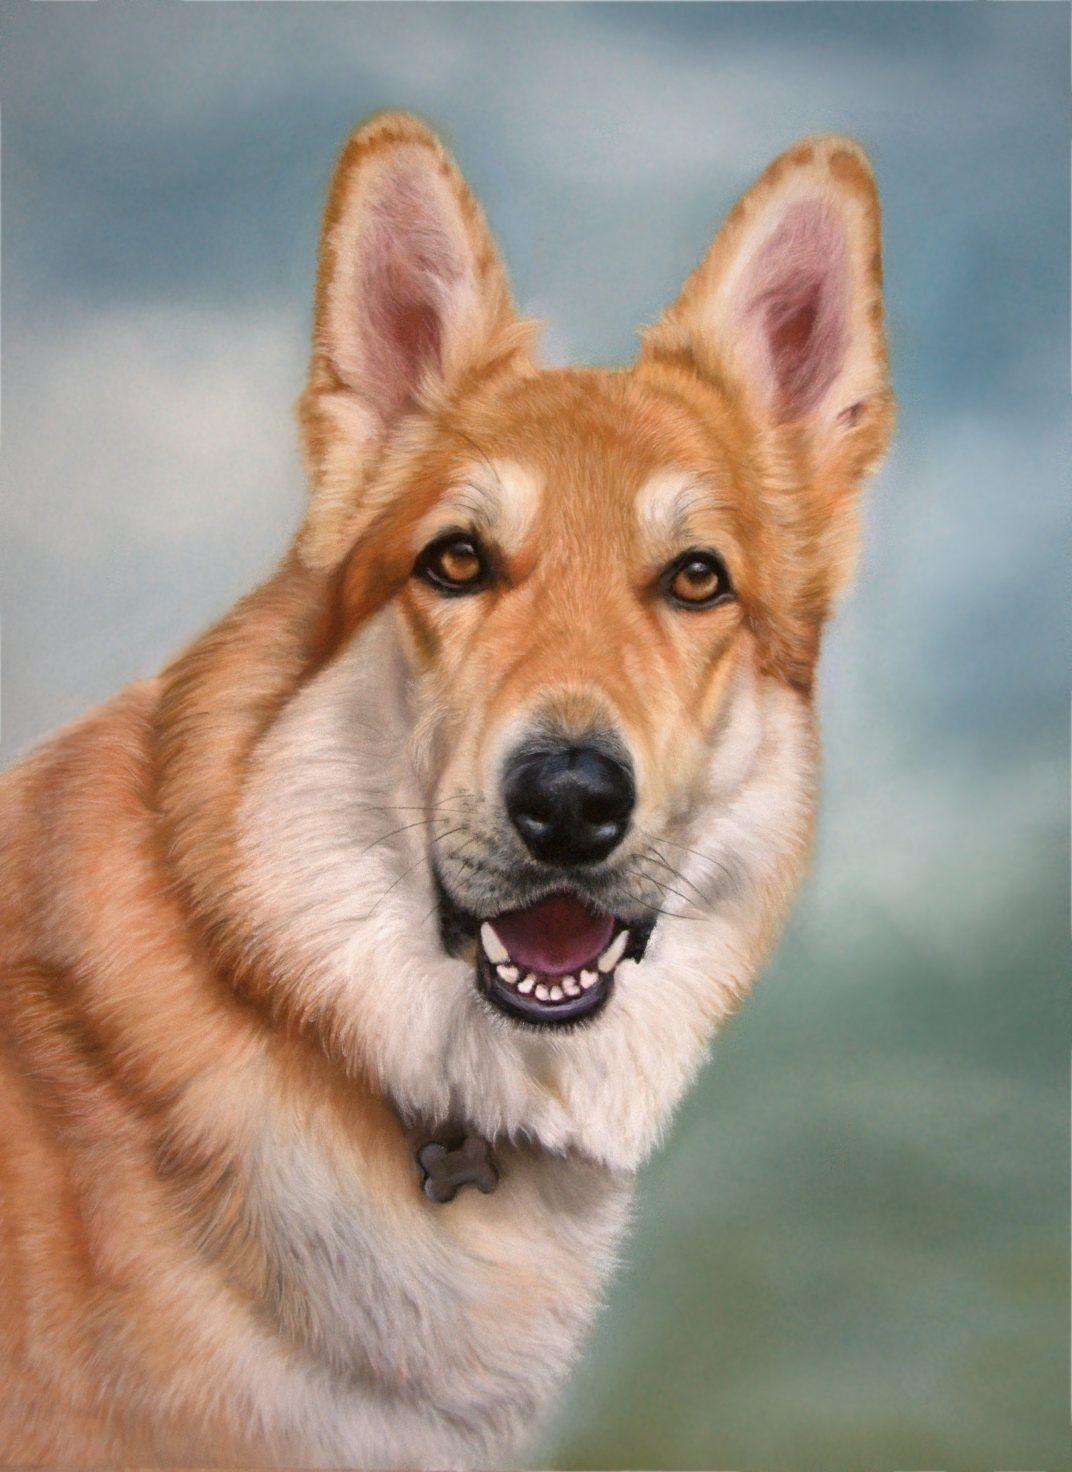 german shepherd dog looking happy